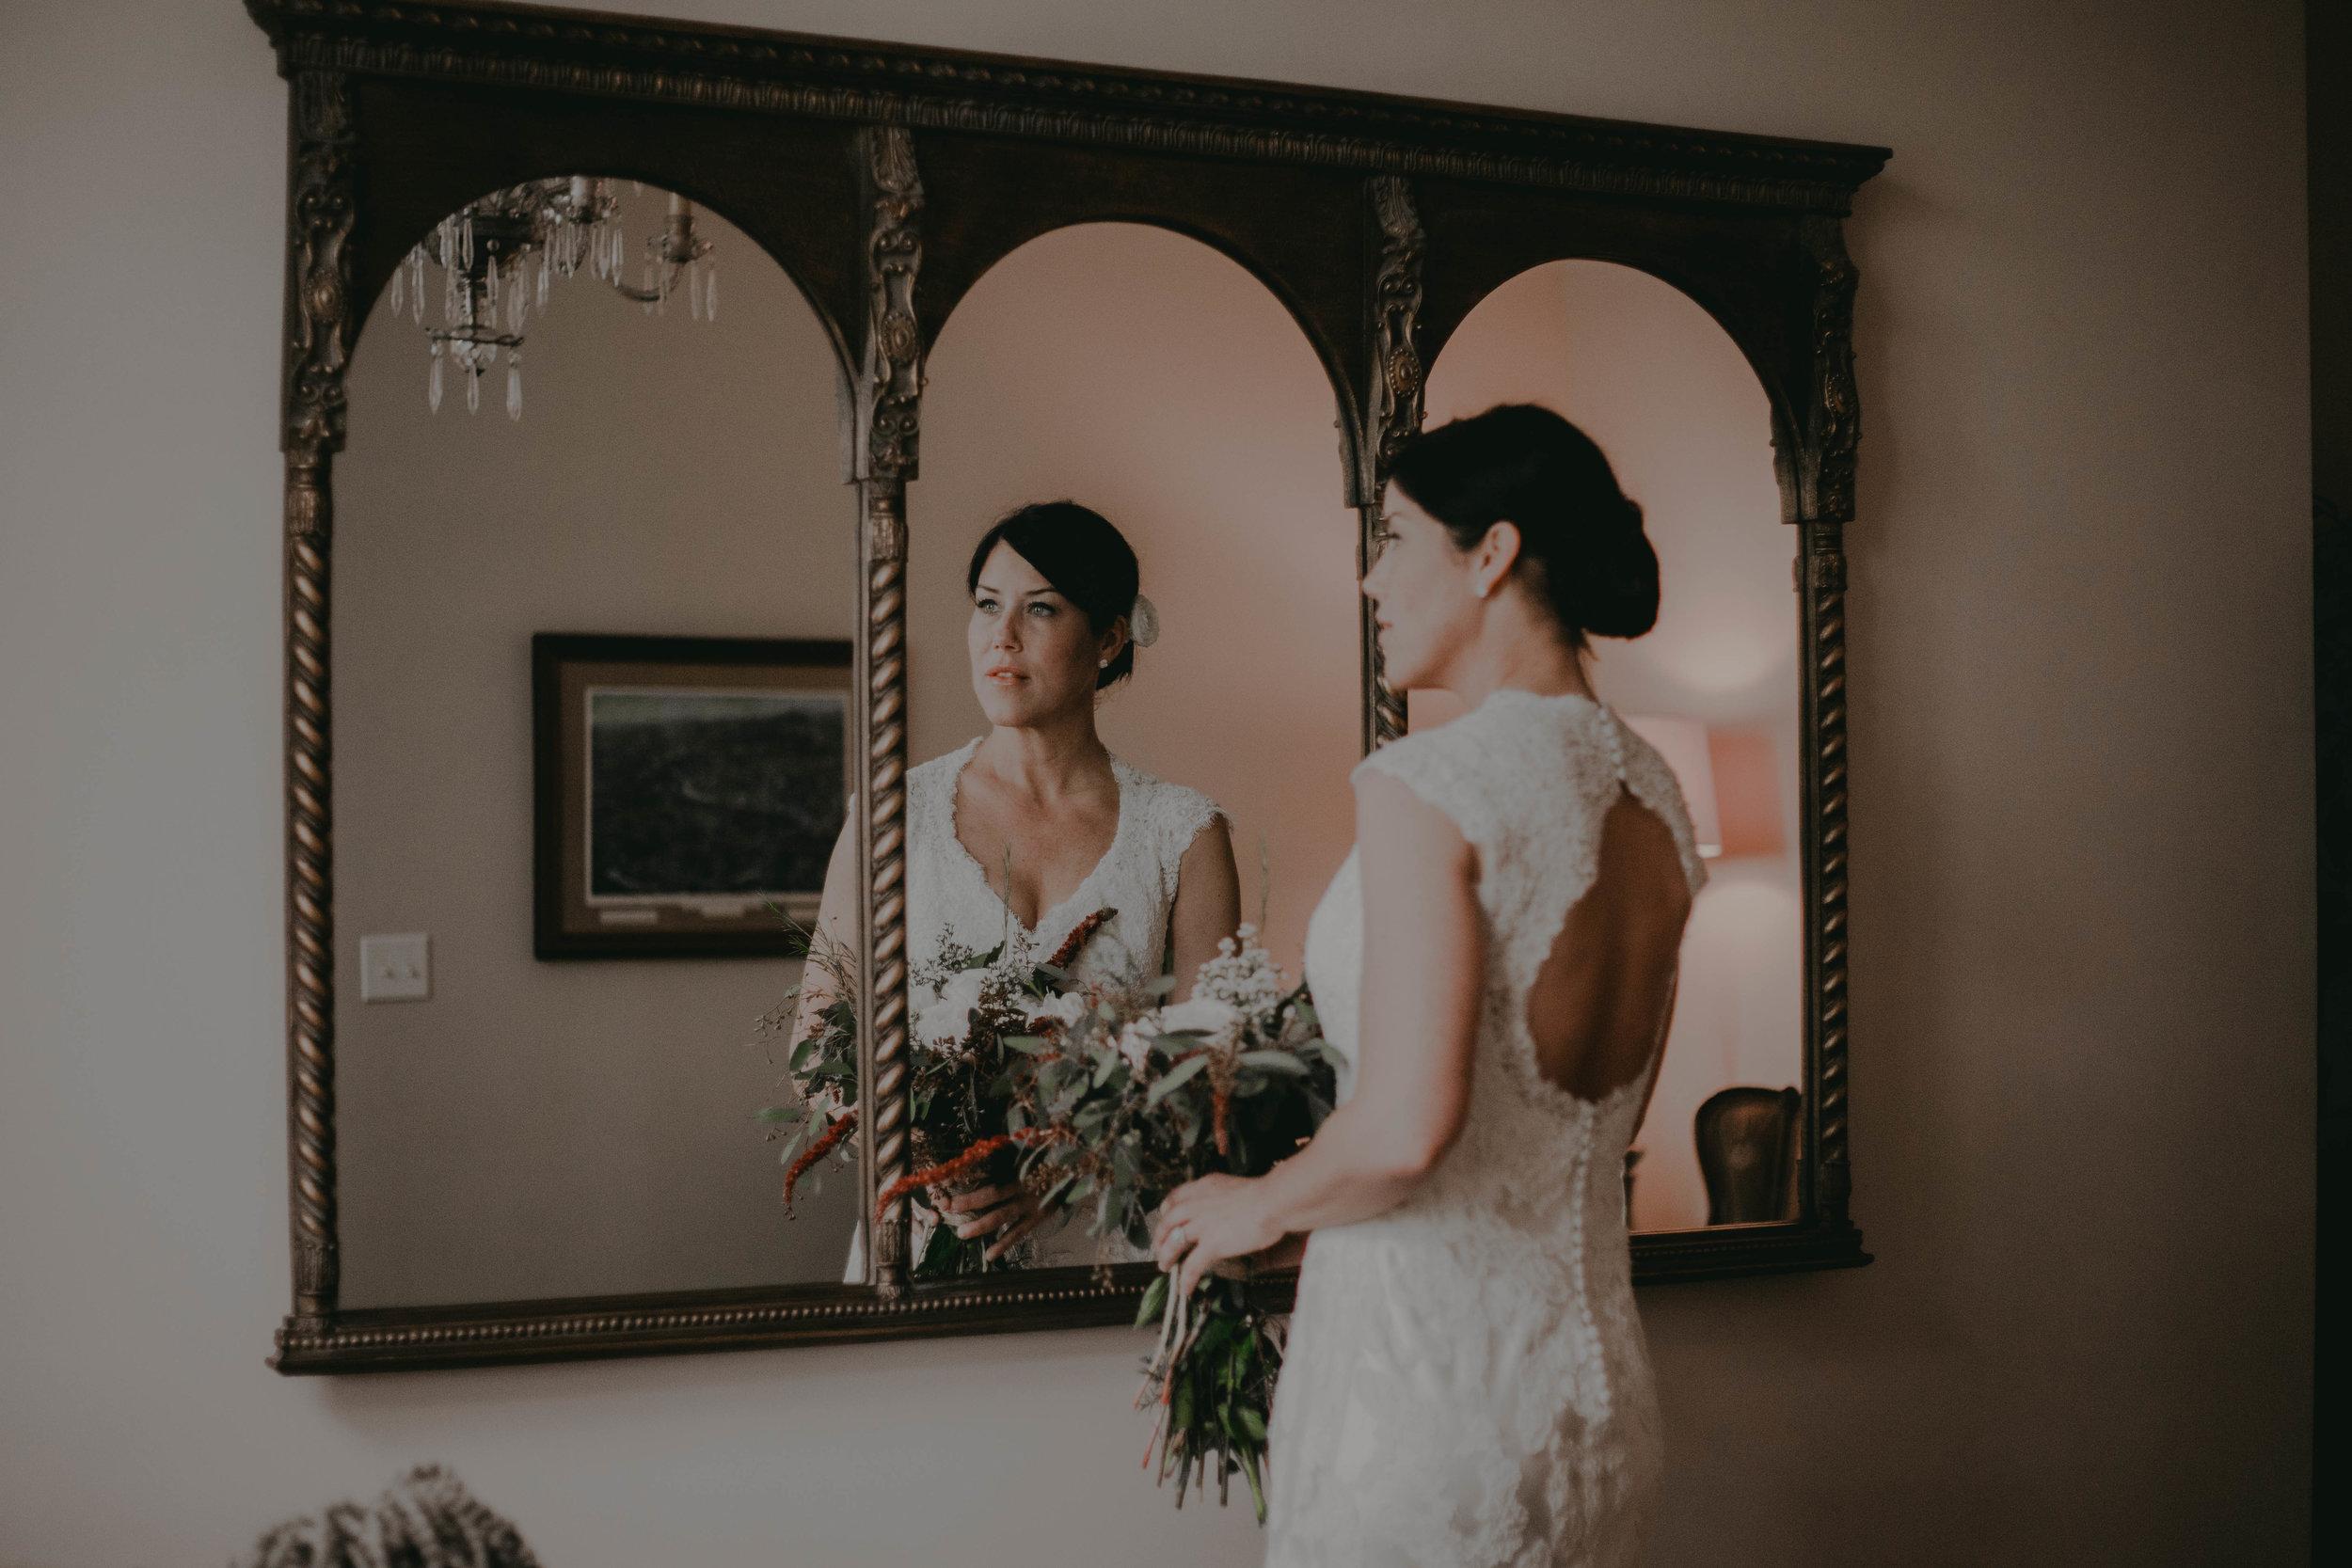 olive-mint-photography-wilson-2018-10.jpg